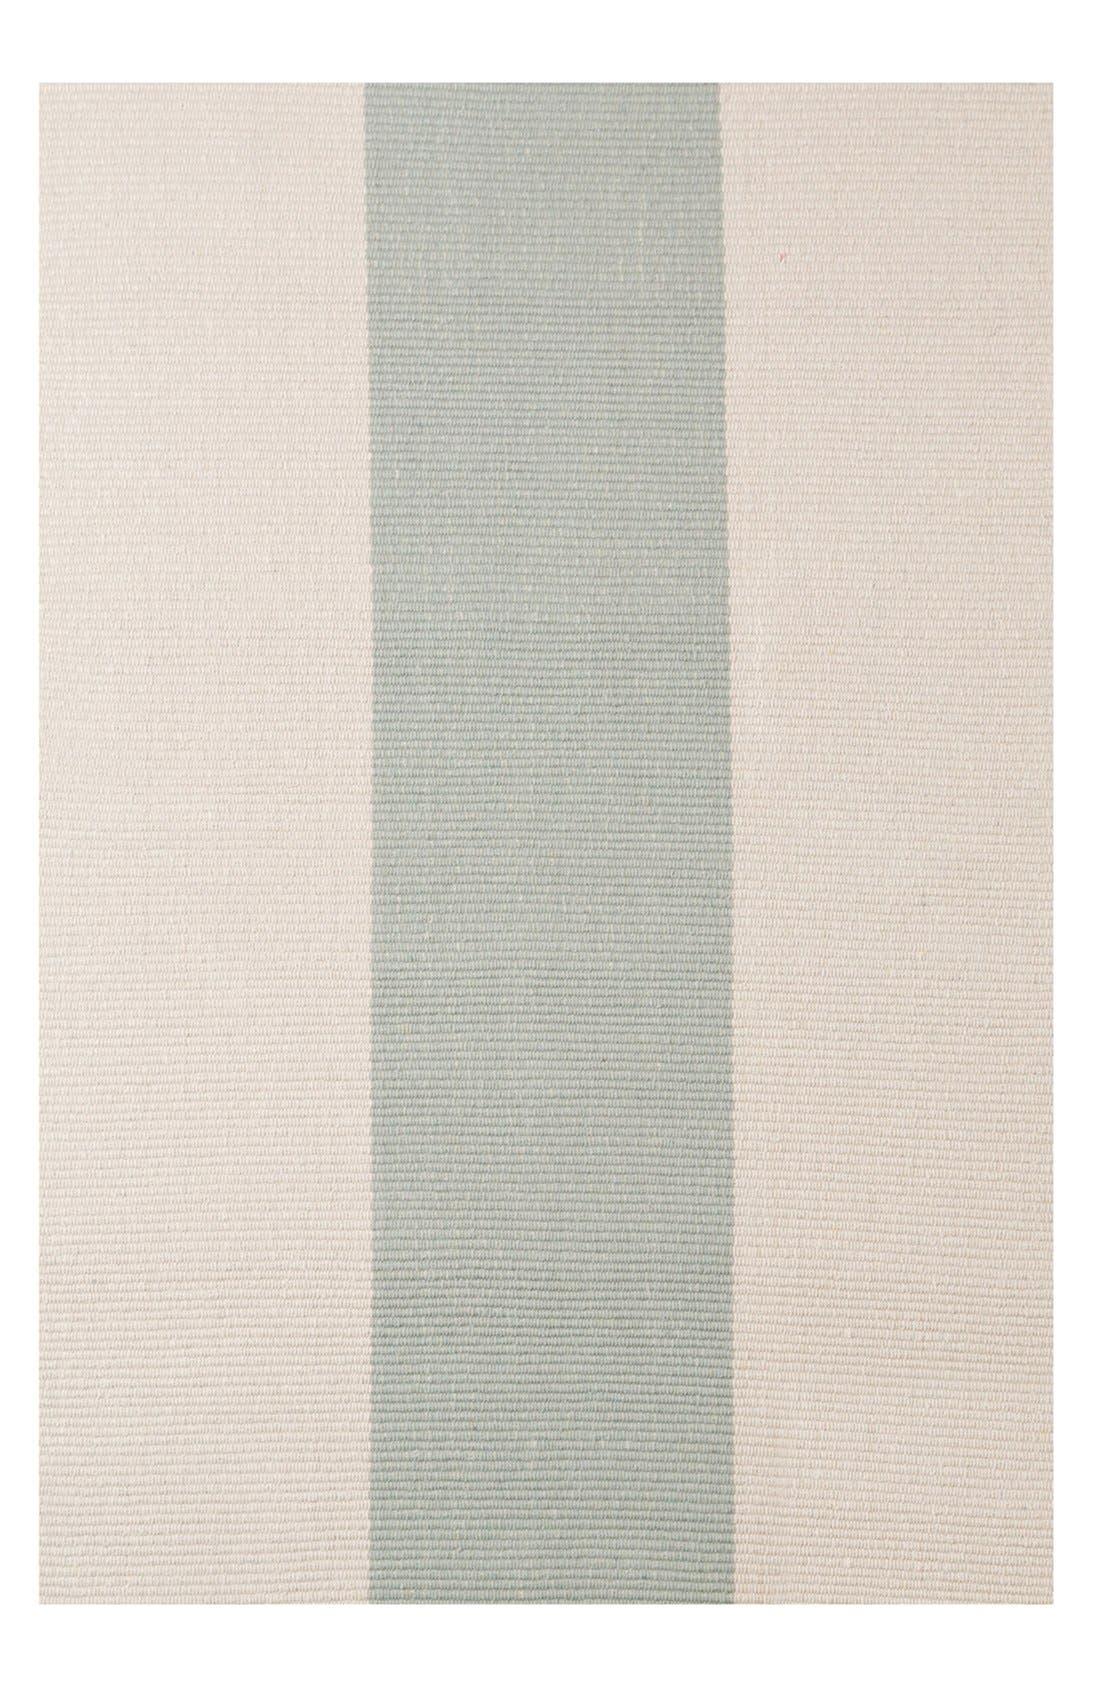 Alternate Image 1 Selected - Dash & Albert 'Yacht' Stripe Rug